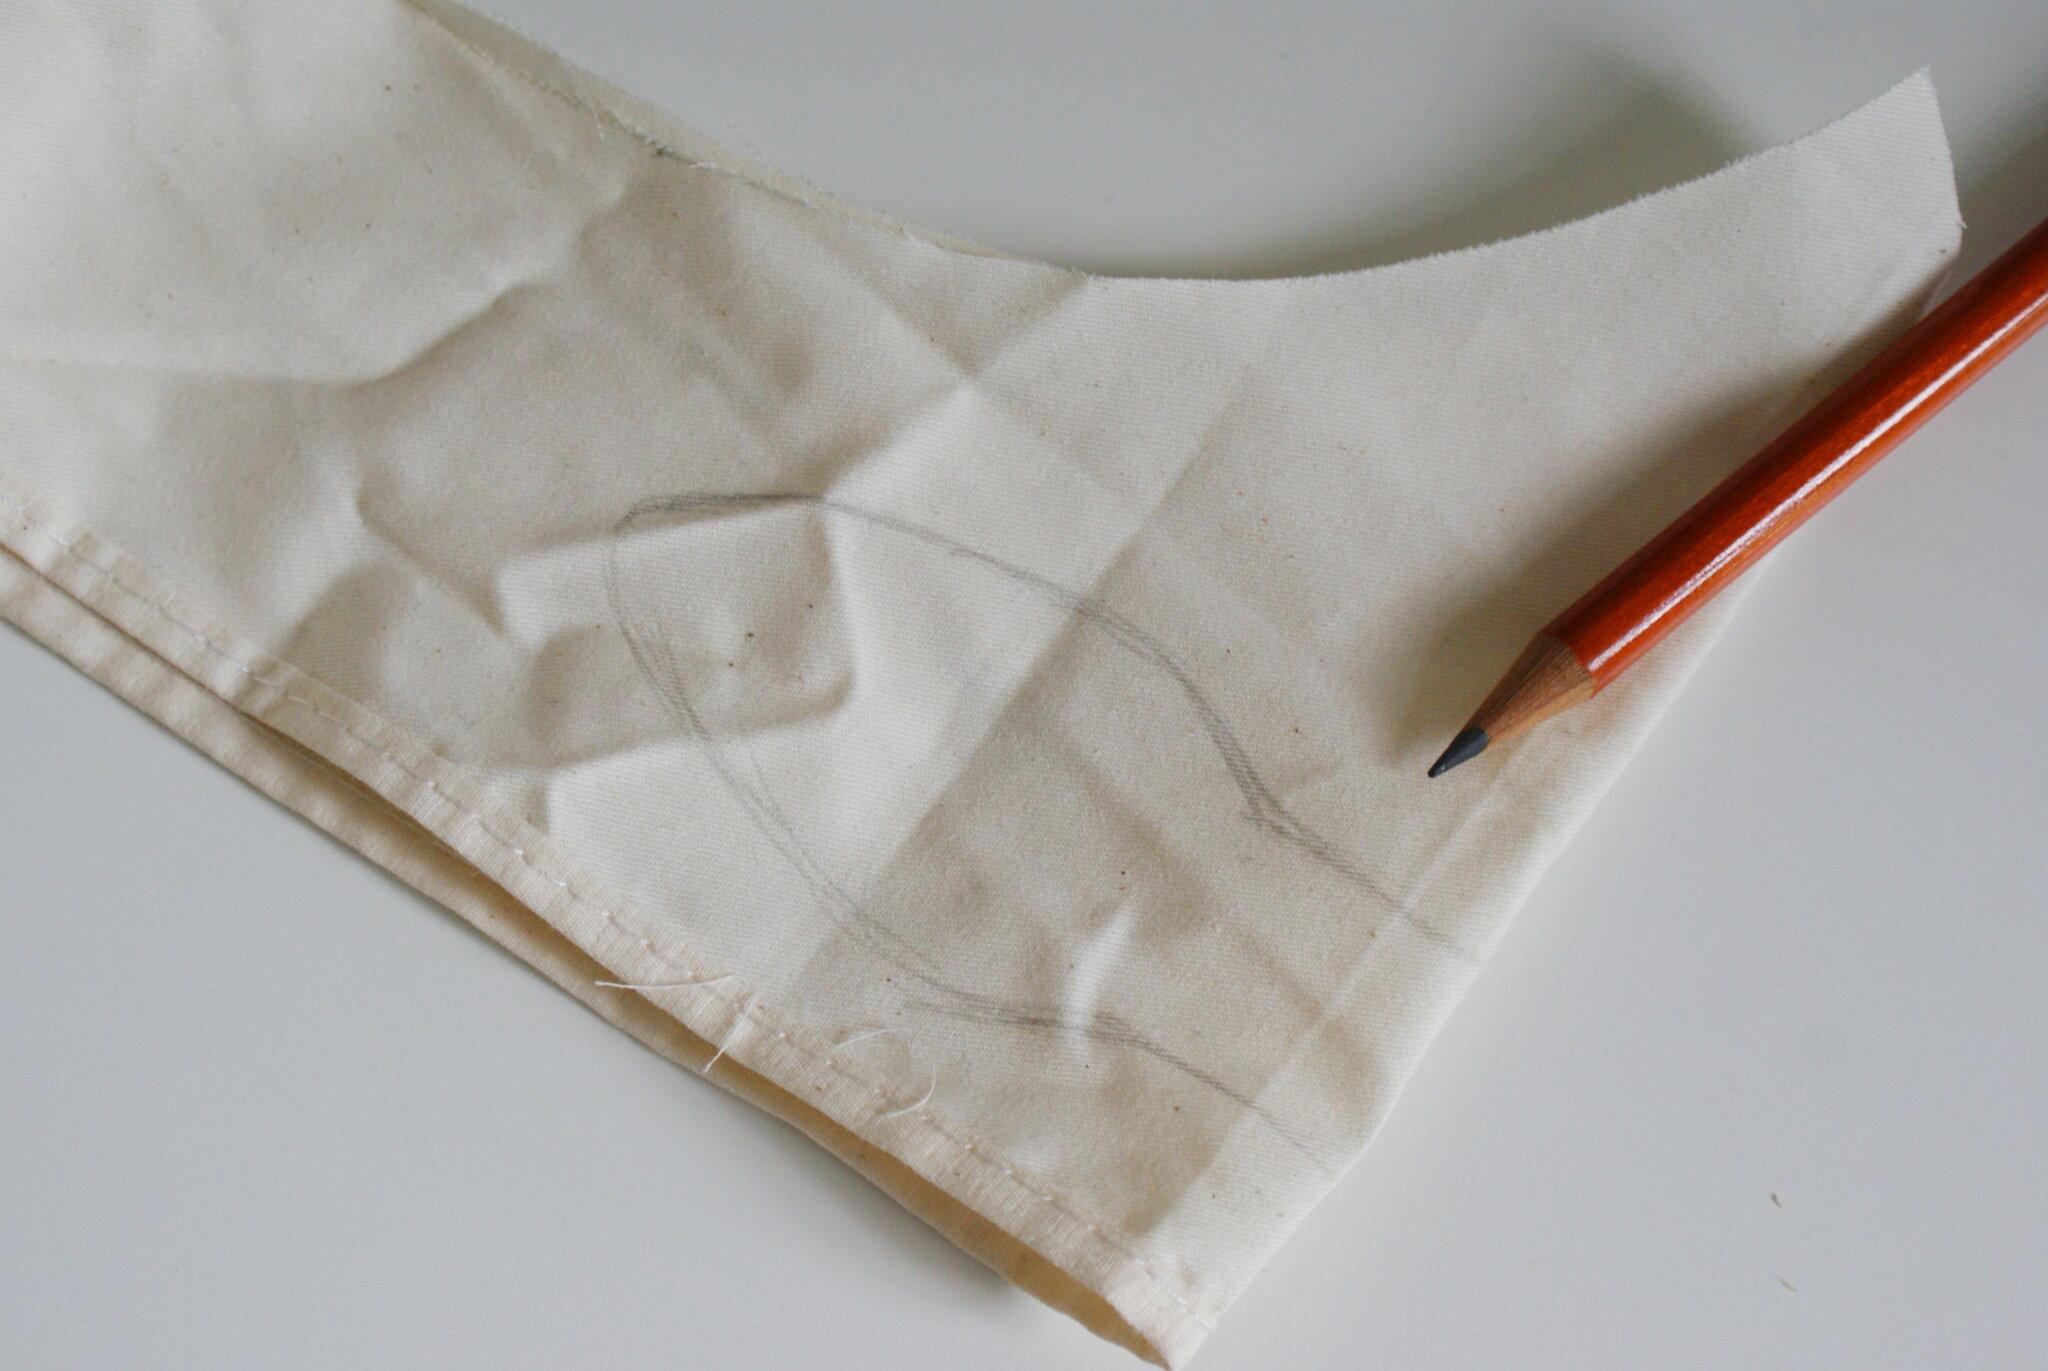 diy bunny ear bow knot hair ties scrunchies tutorial how make home sewing easy handmade